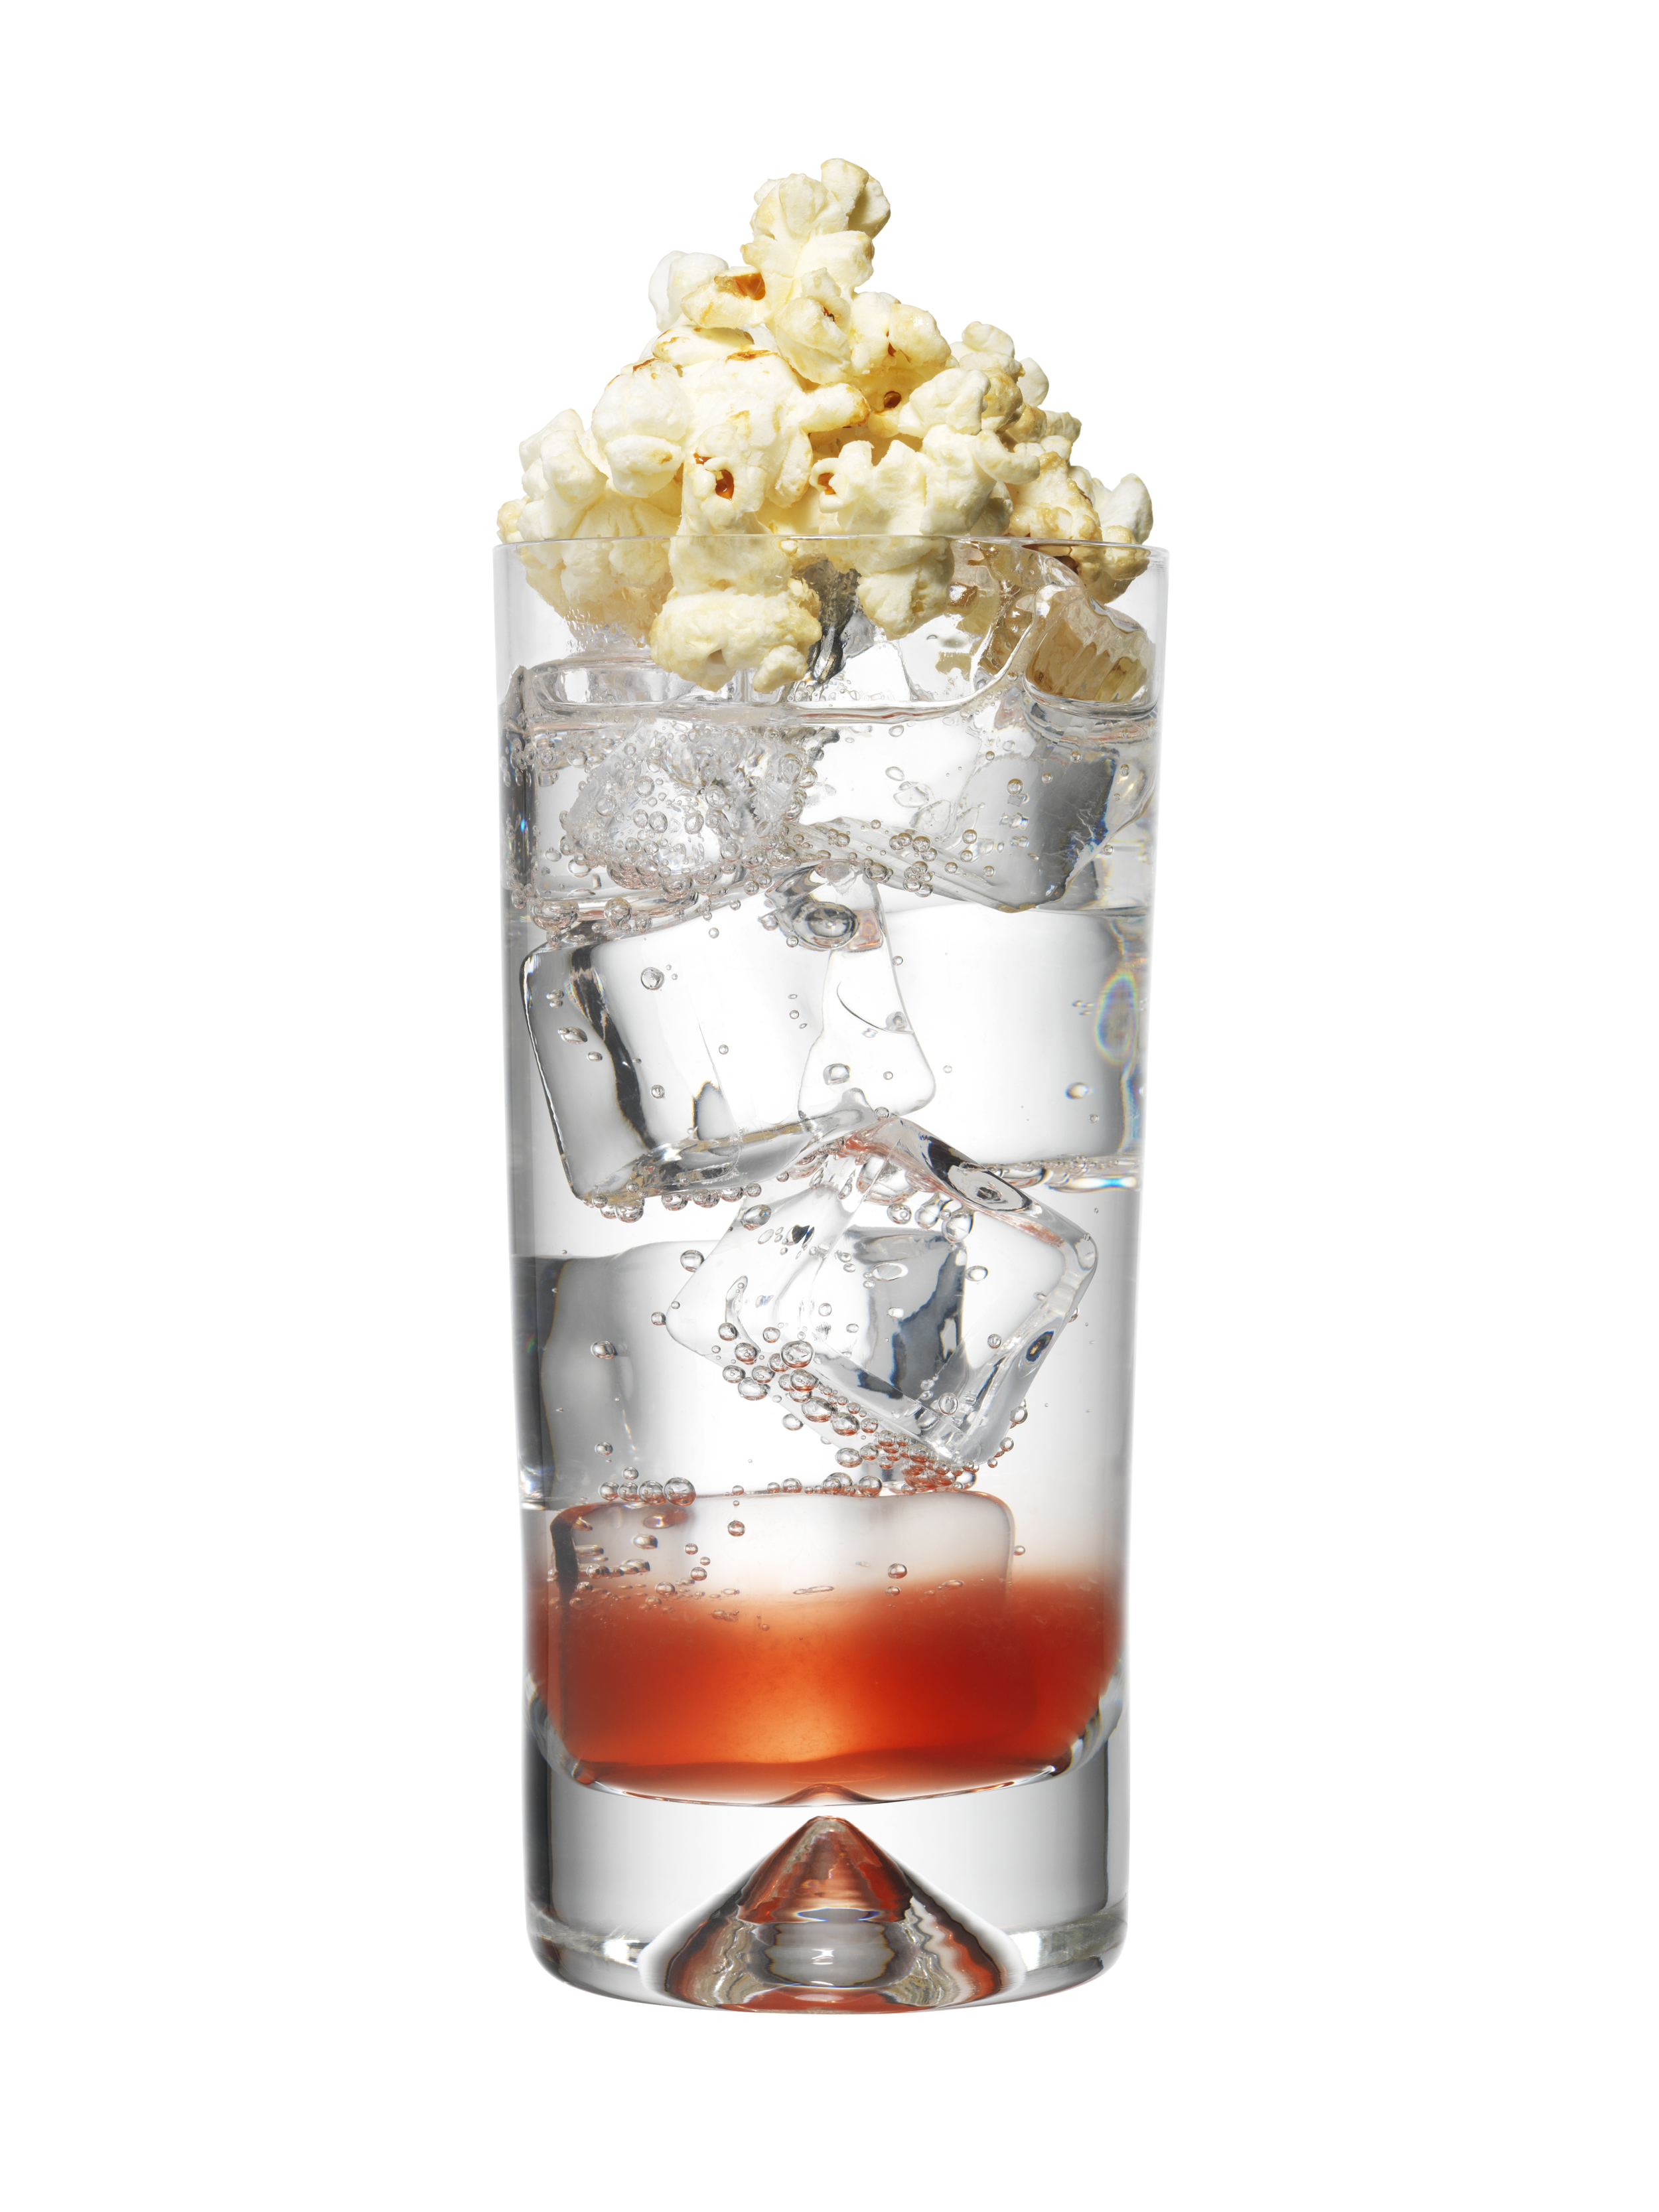 The Waltzer - 50ml Big Dipper Gin20ml Lemon JuiceDash Raspberry Cordial100ml Cream Soda